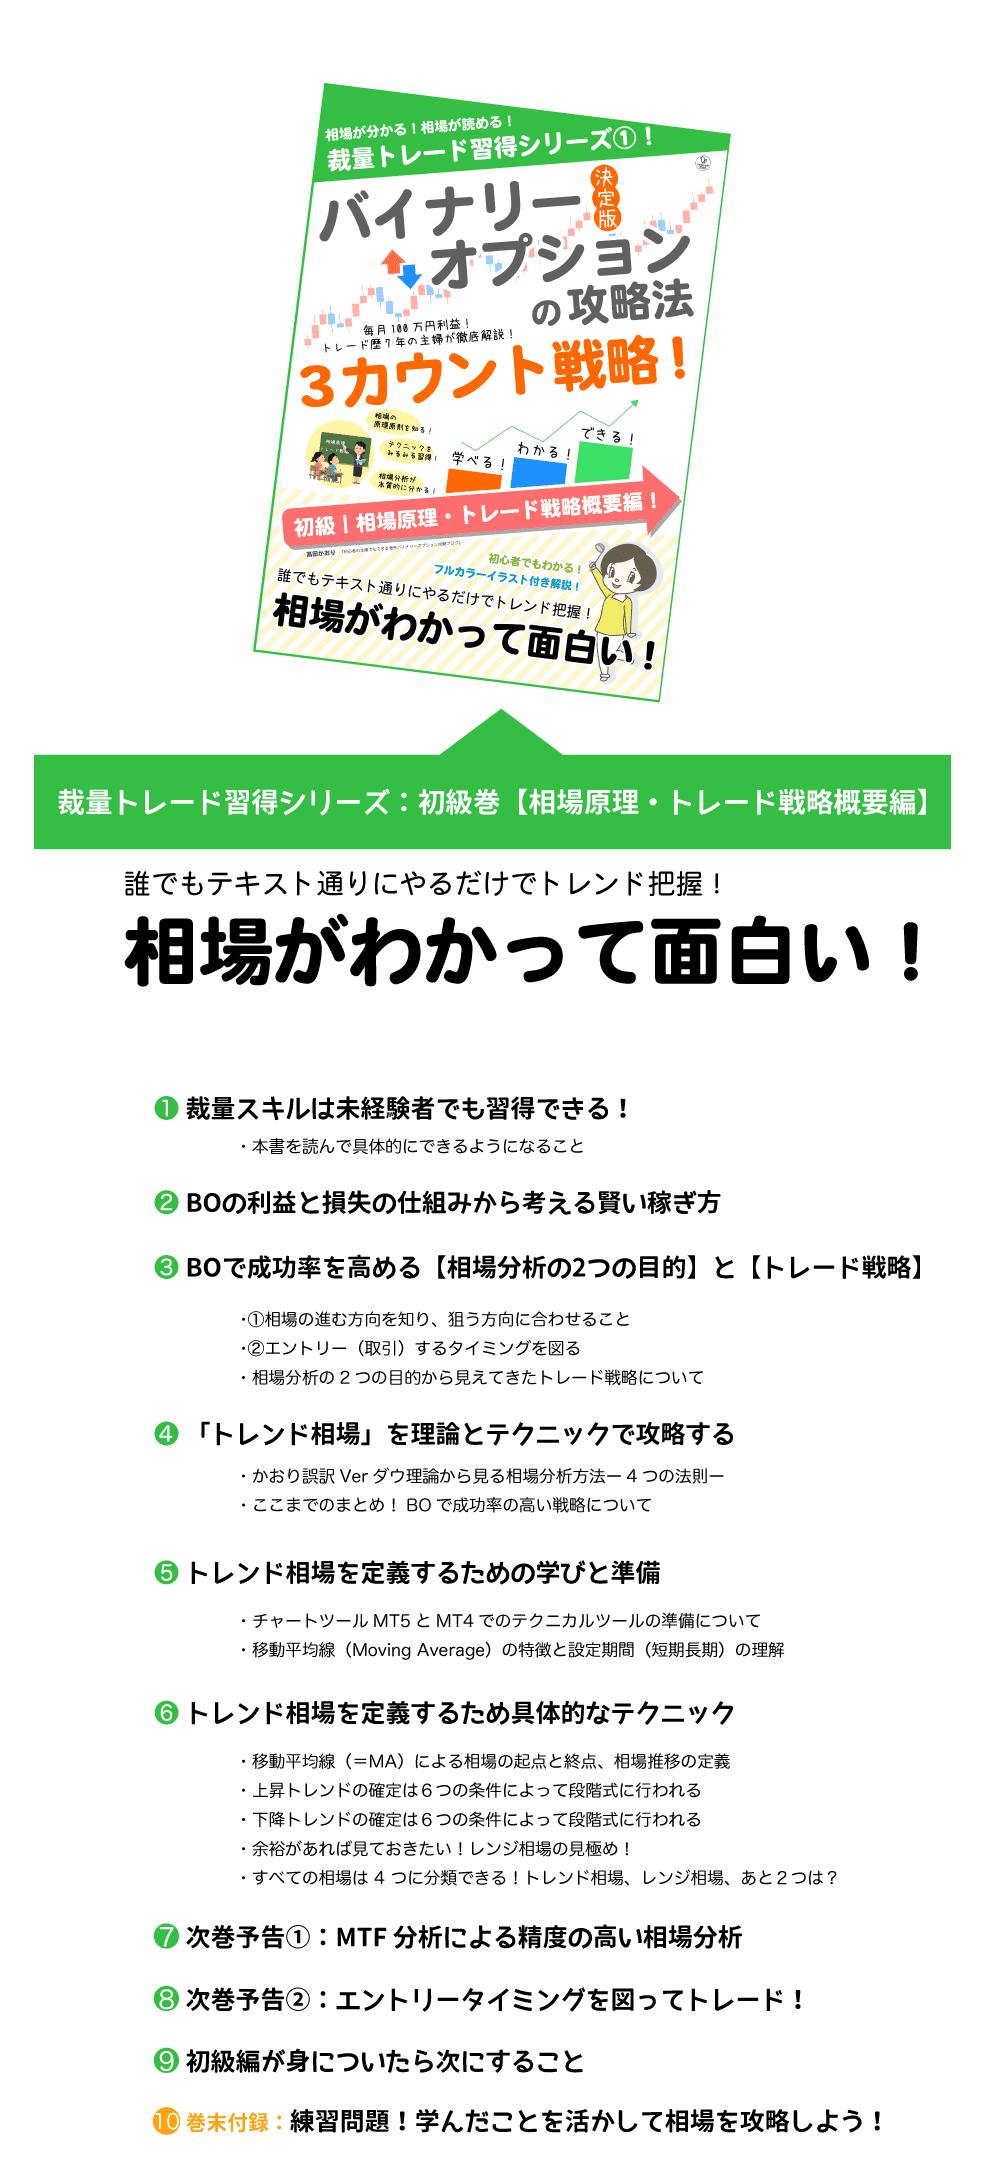 3countsyokyugaiyou-01.png